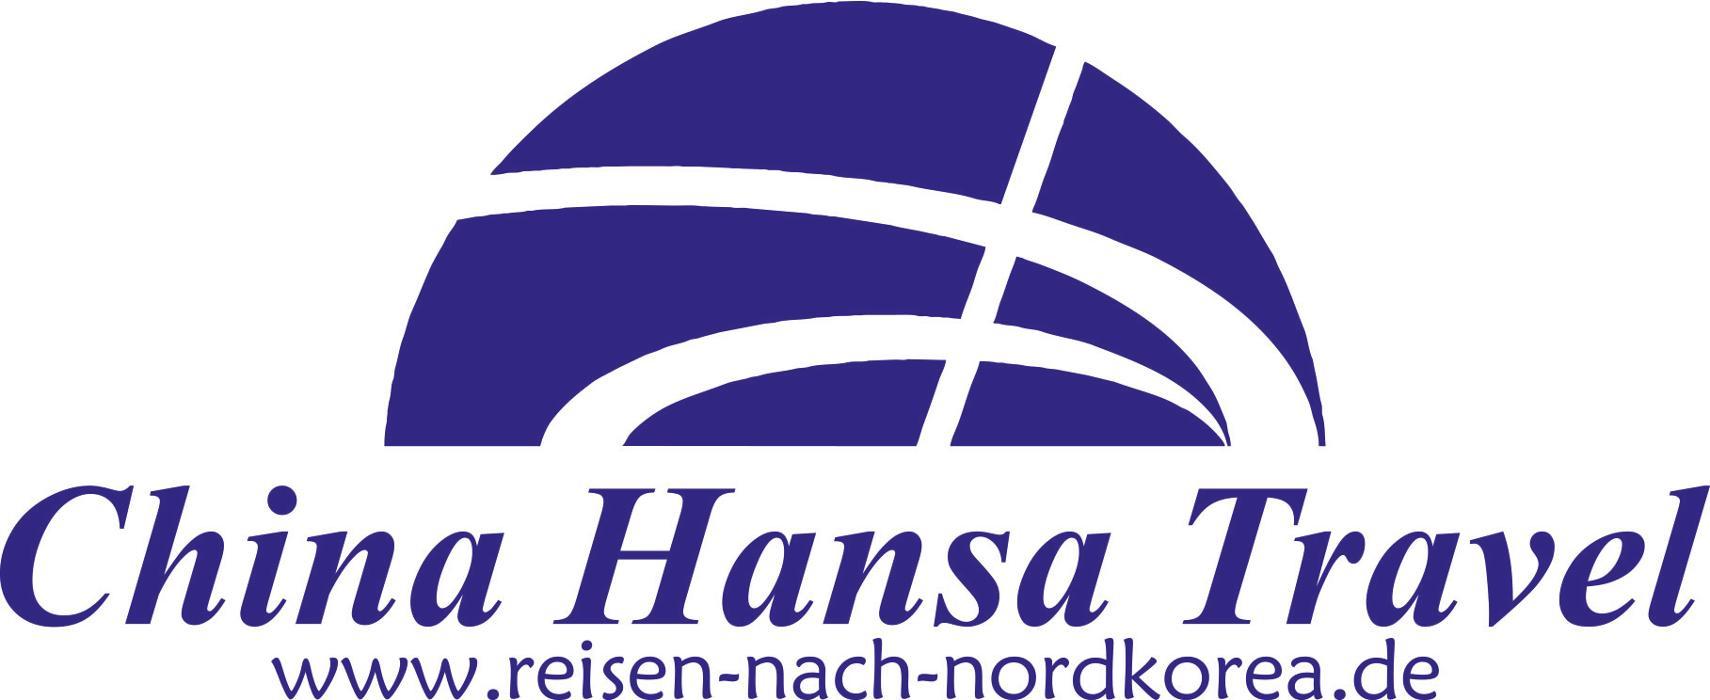 Nordkorea Reisen - China Hansa Travel